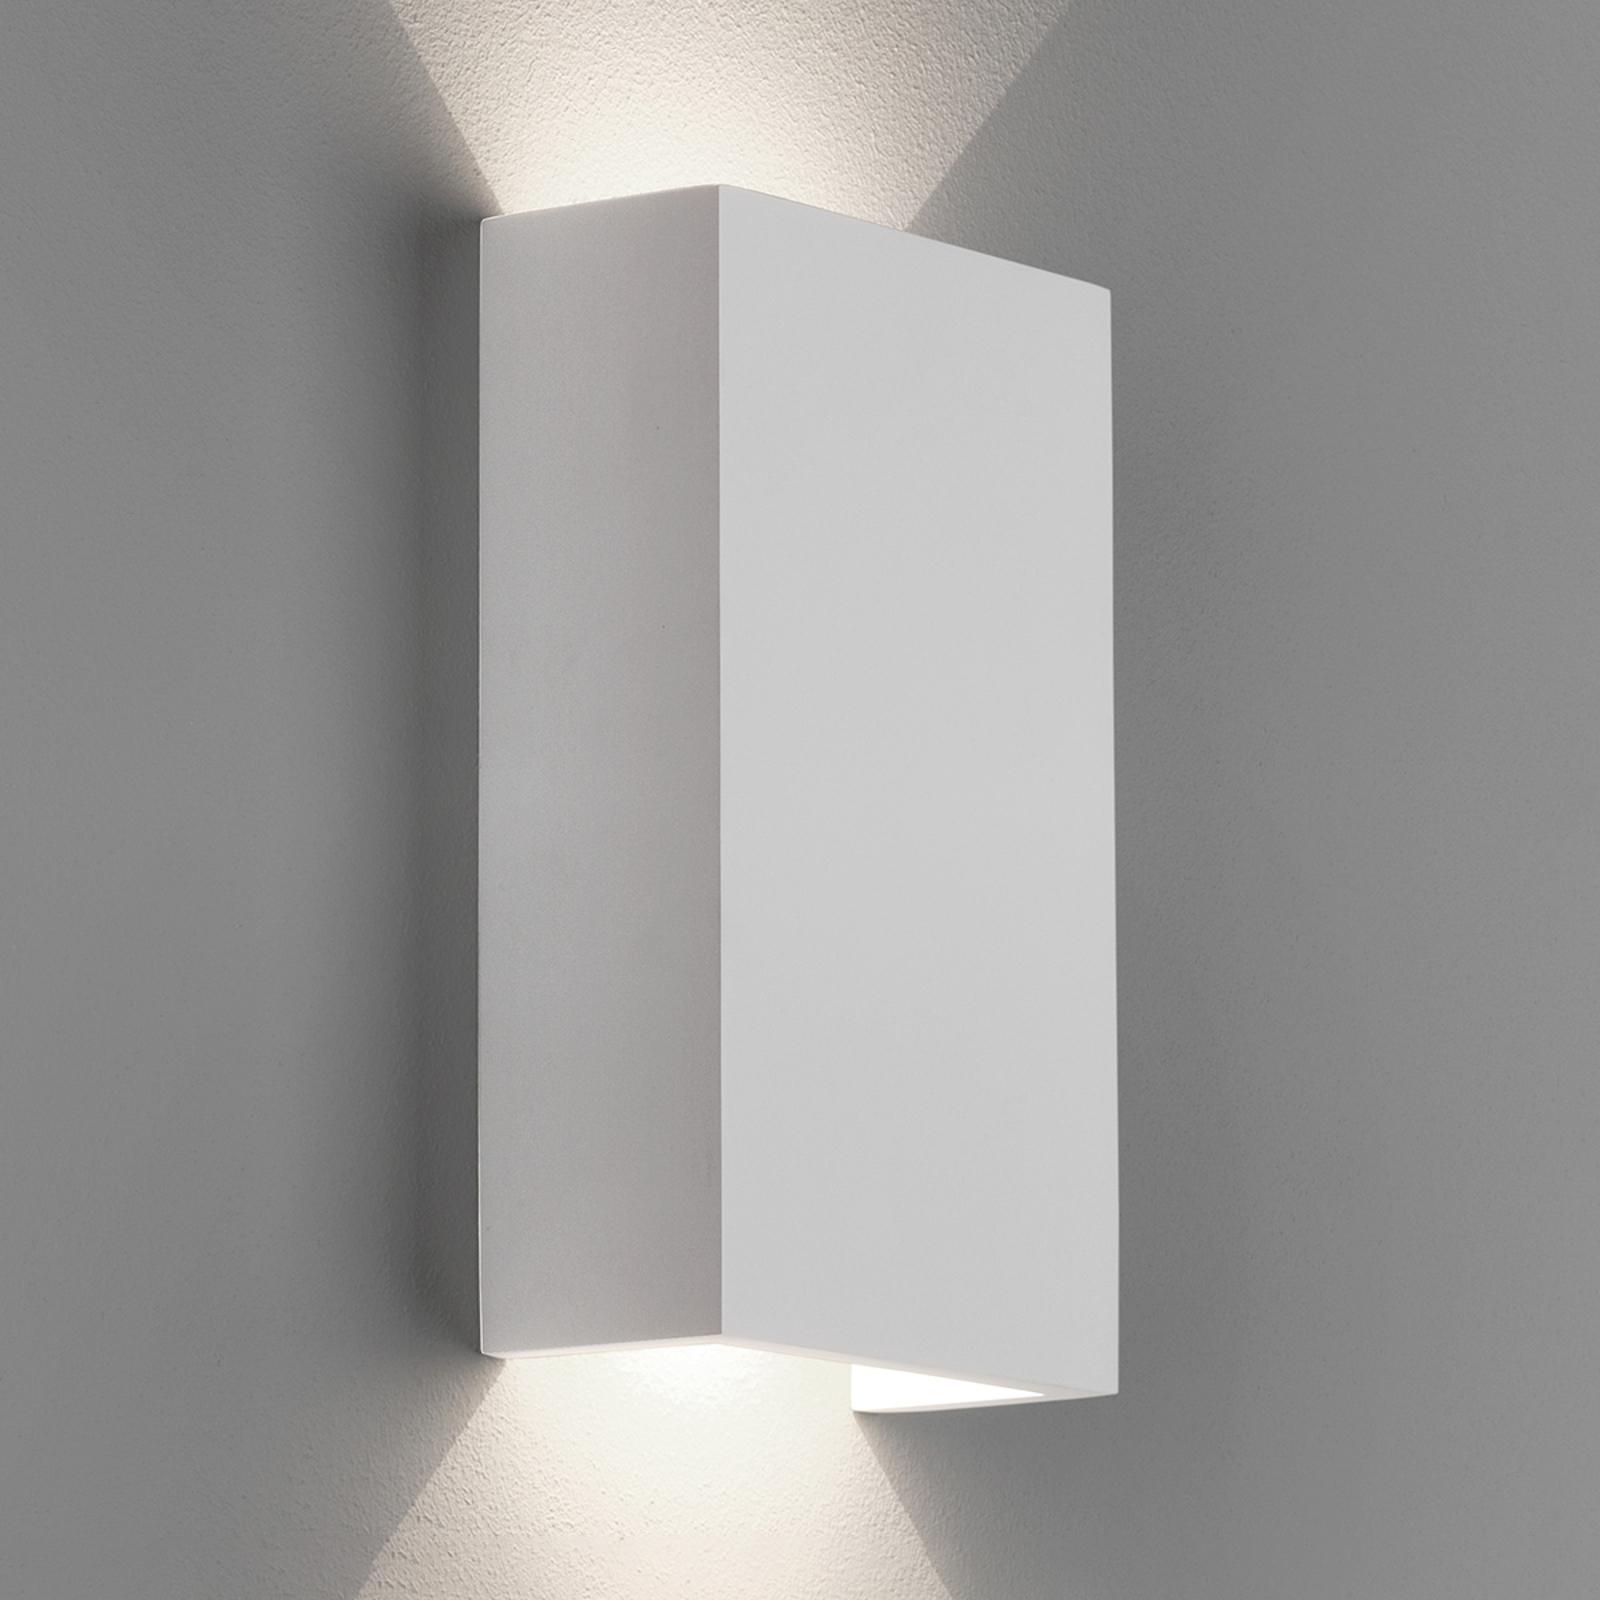 Astro Rio 125 lampa ścienna LED z gipsu, 2700K